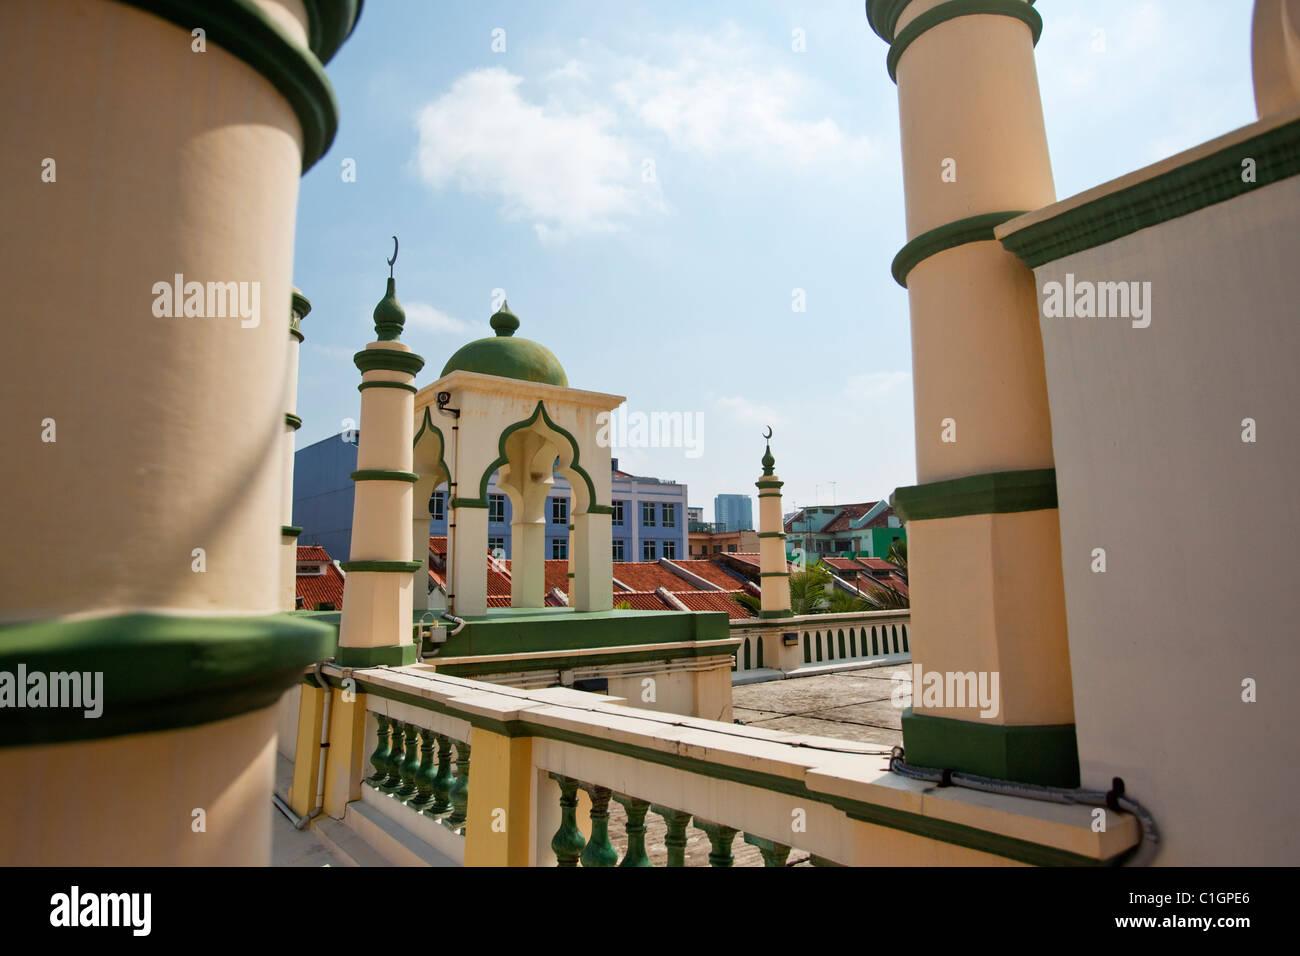 Architettura islamica di Abdul Gaffoor moschea. Little India, Singapore Immagini Stock